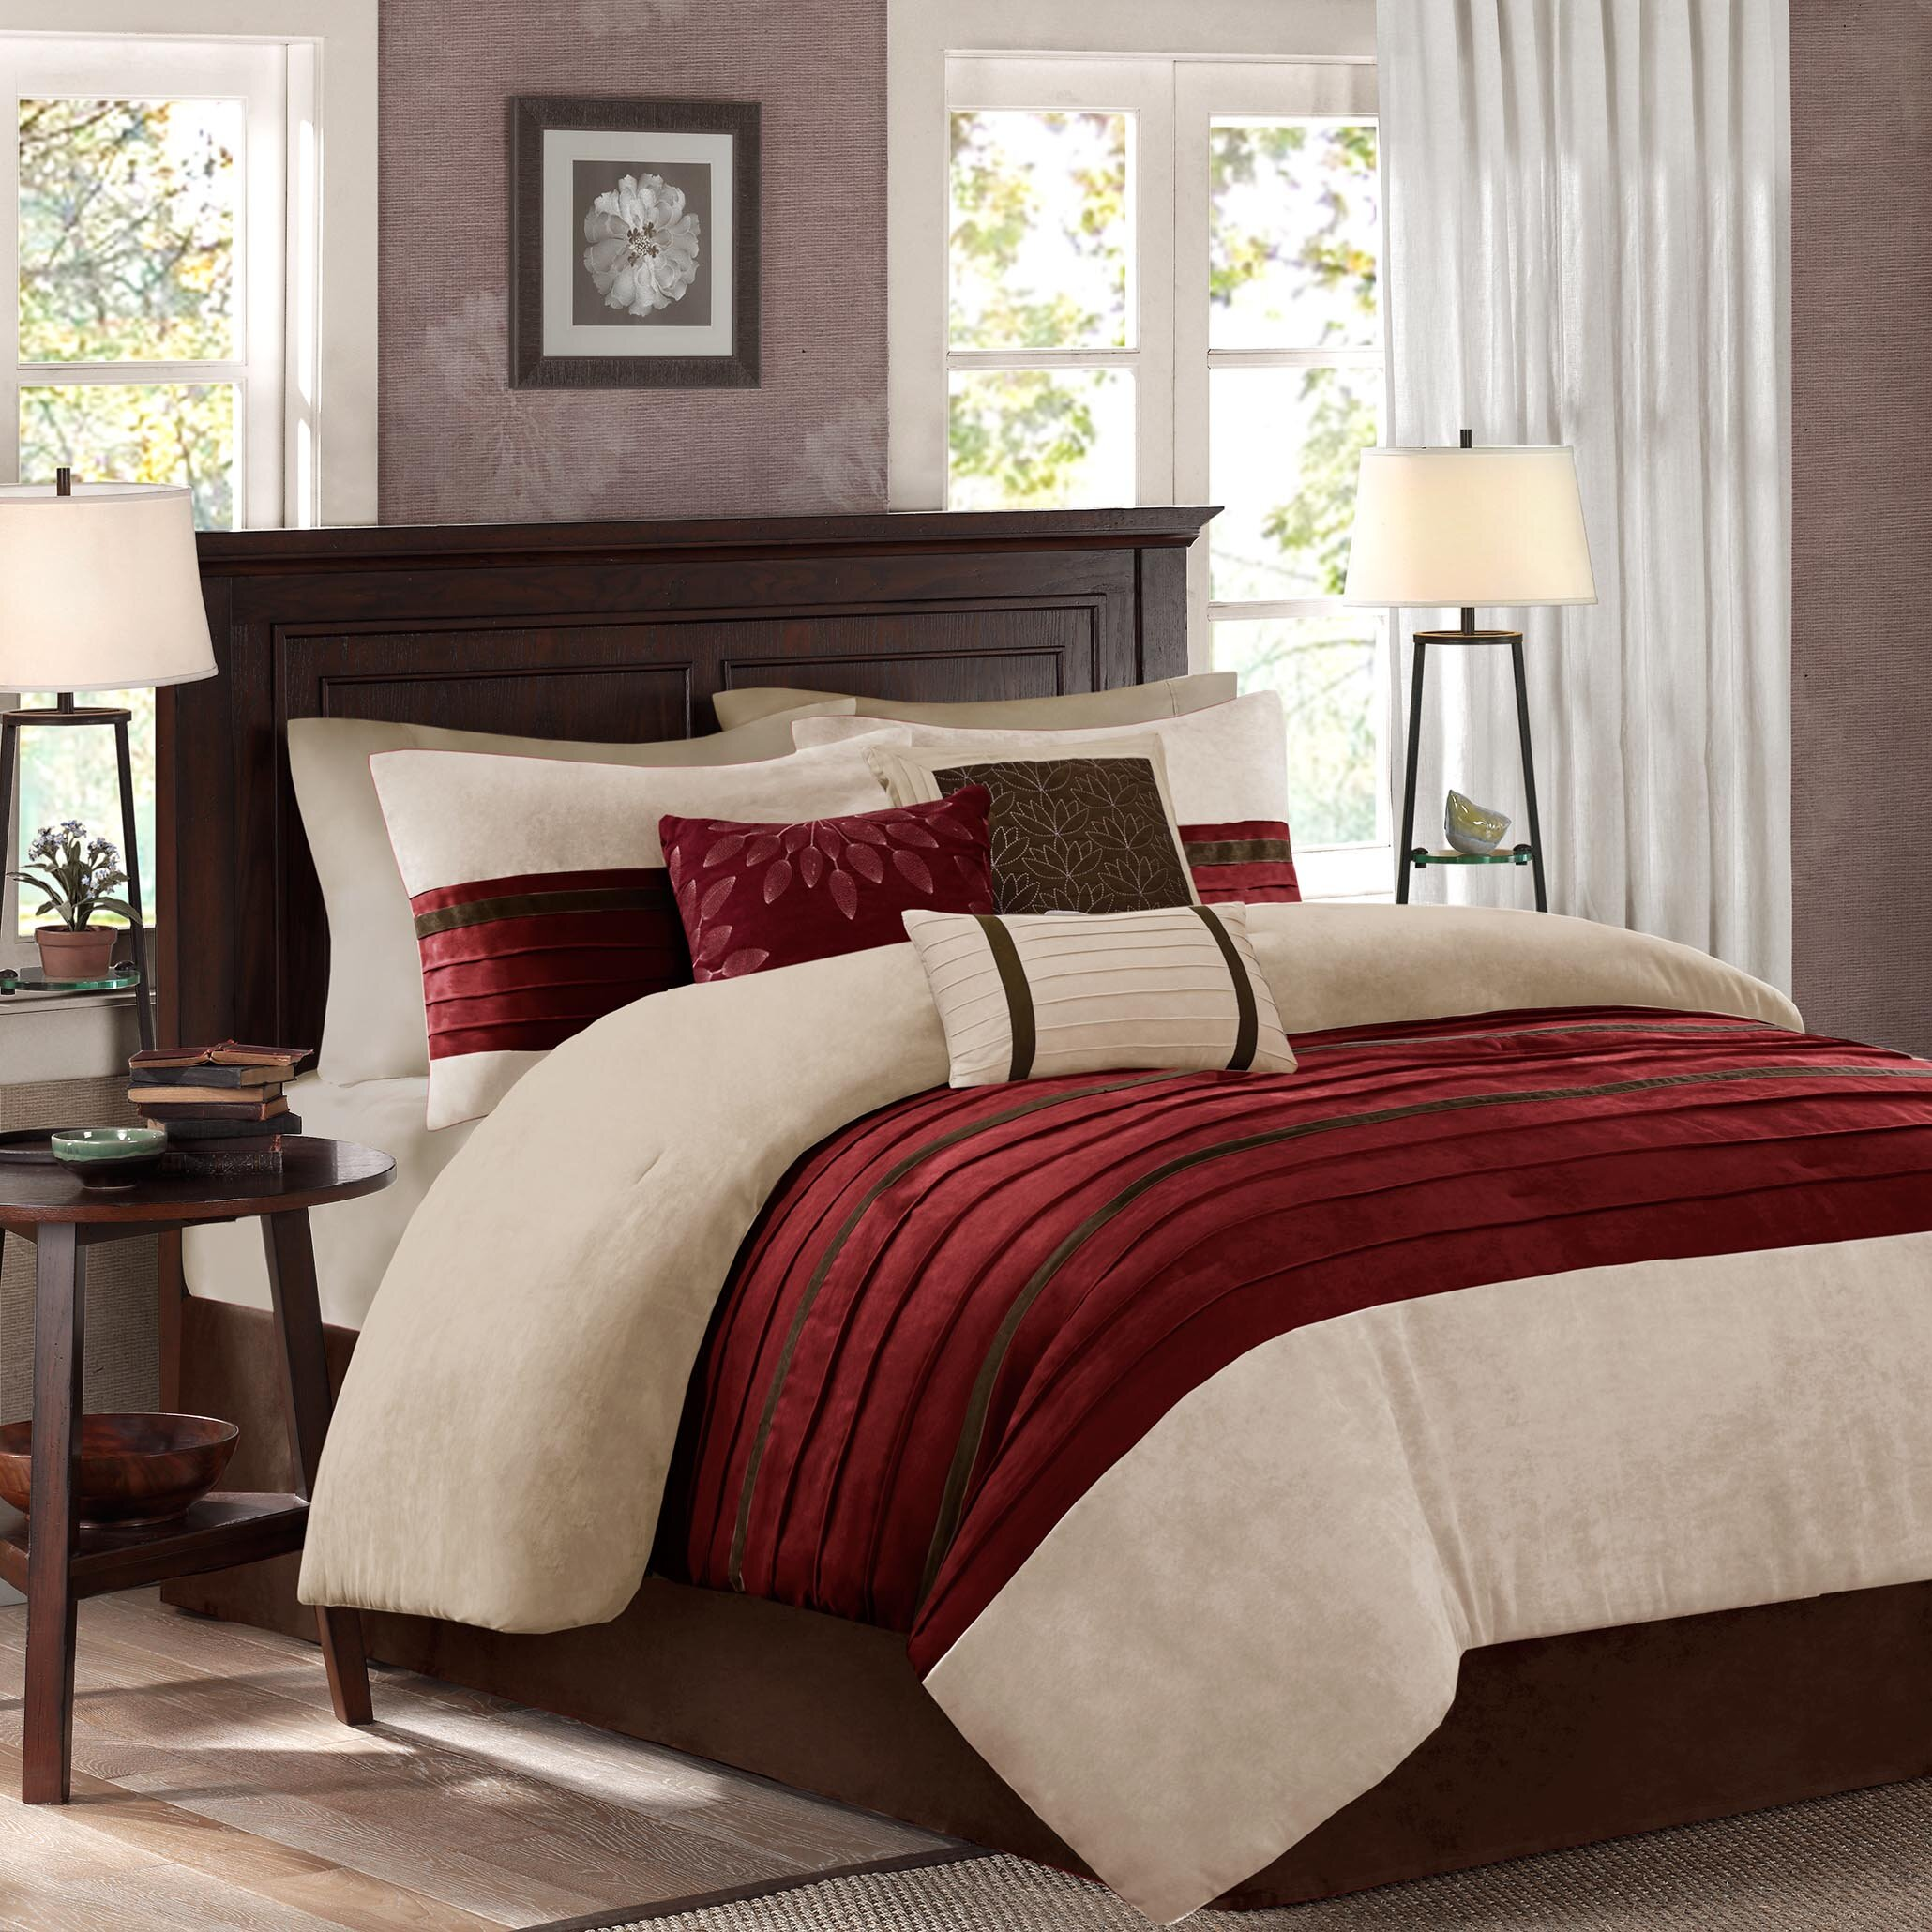 latitude run caleb 7 piece comforter set reviews wayfair. Black Bedroom Furniture Sets. Home Design Ideas